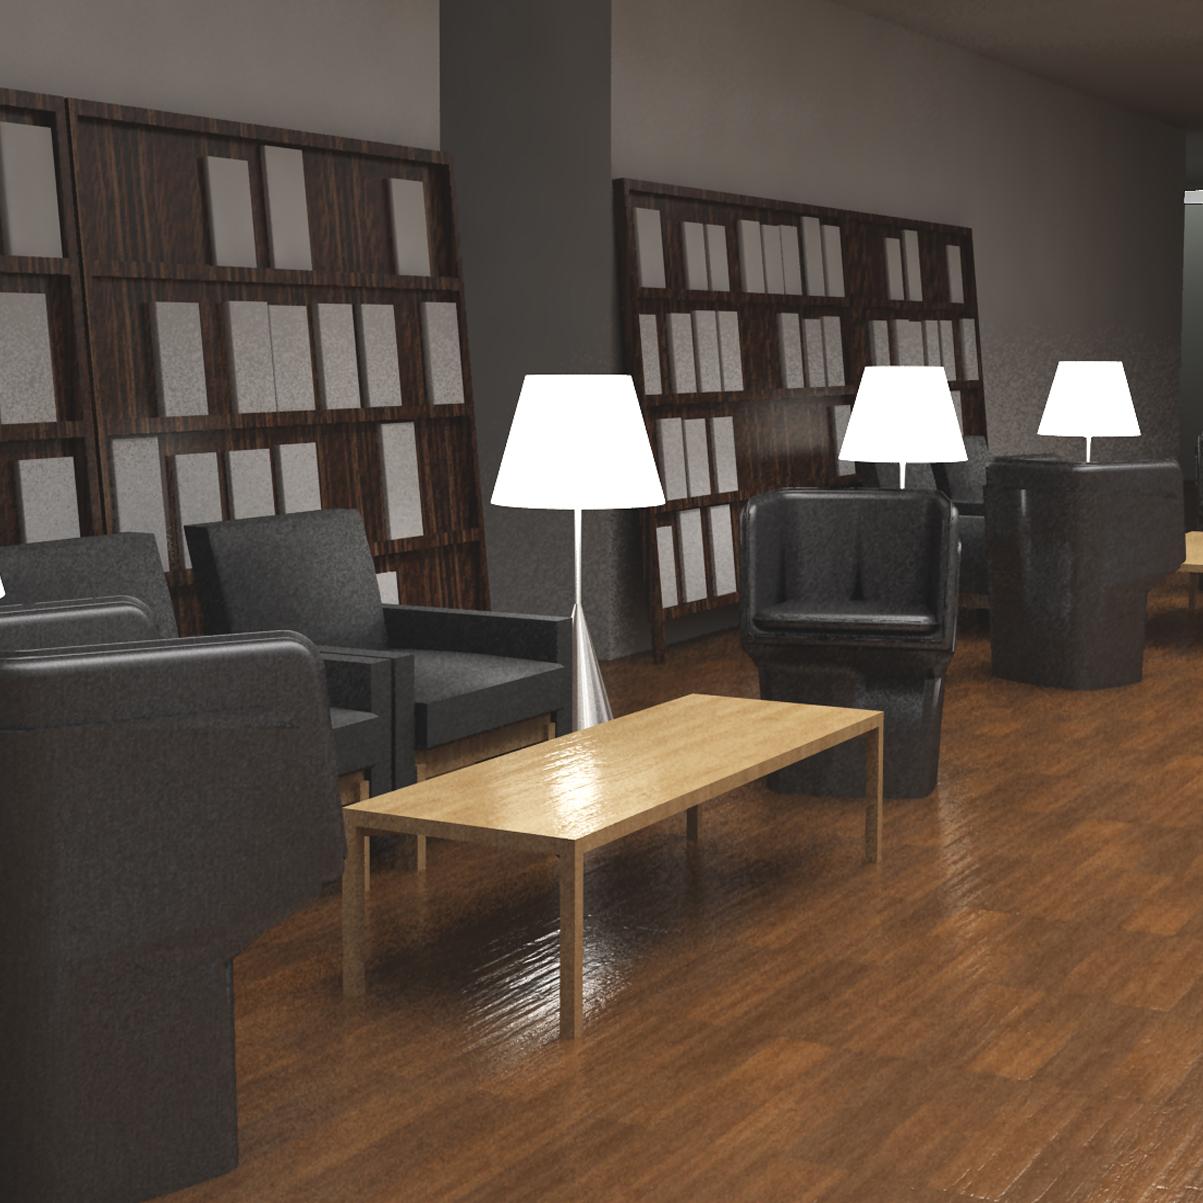 Interior Design Project - Aljezur Hotel